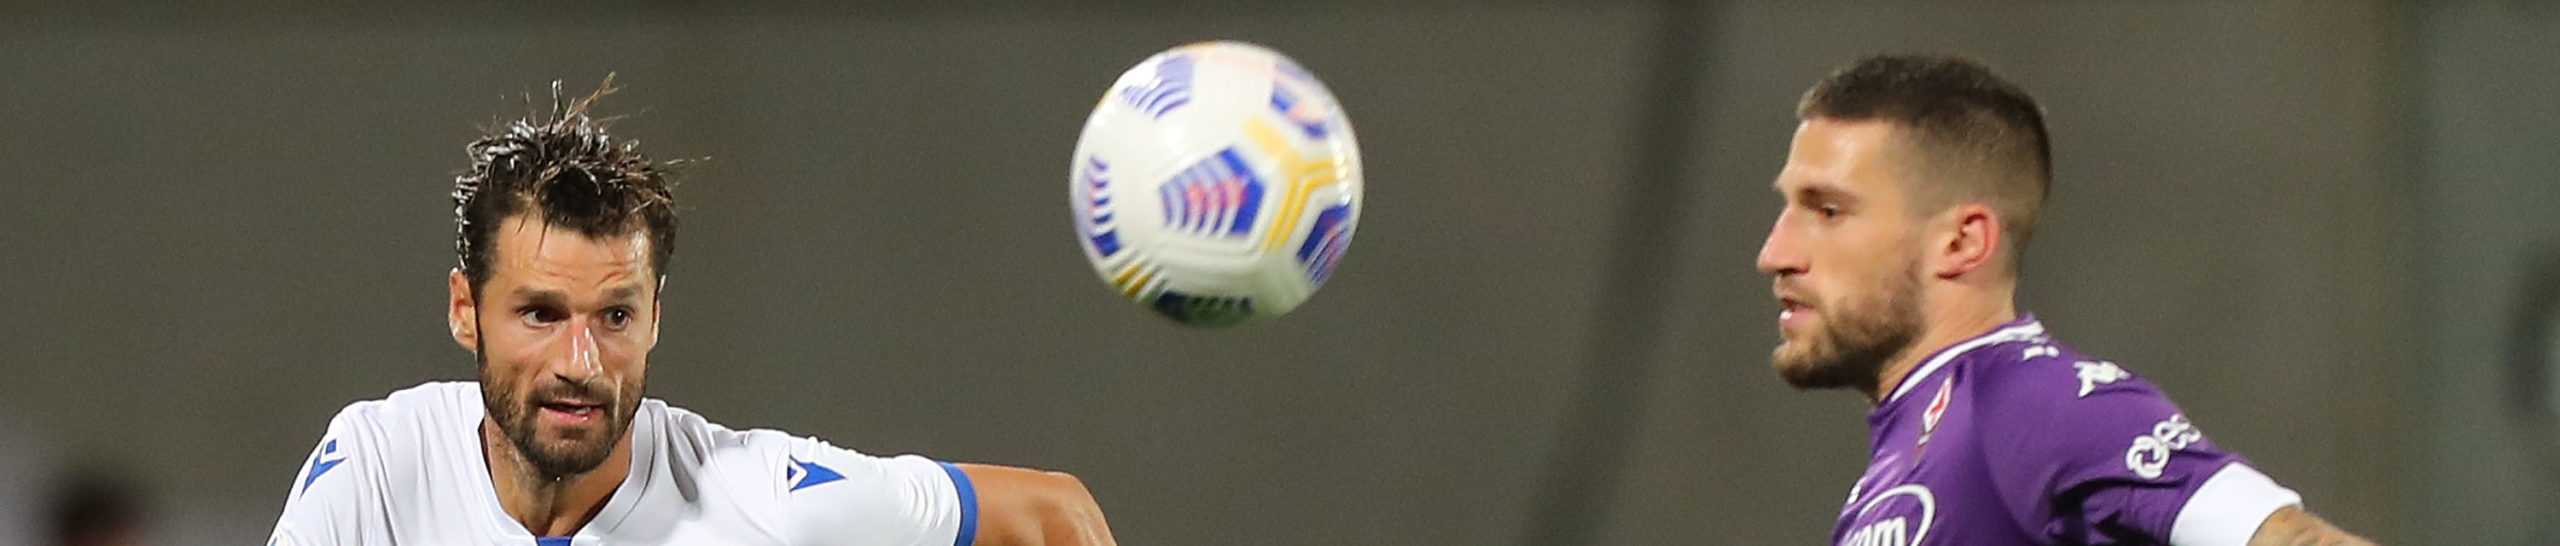 Sampdoria-Fiorentina, sfida tra due squadre in cerca di conferme